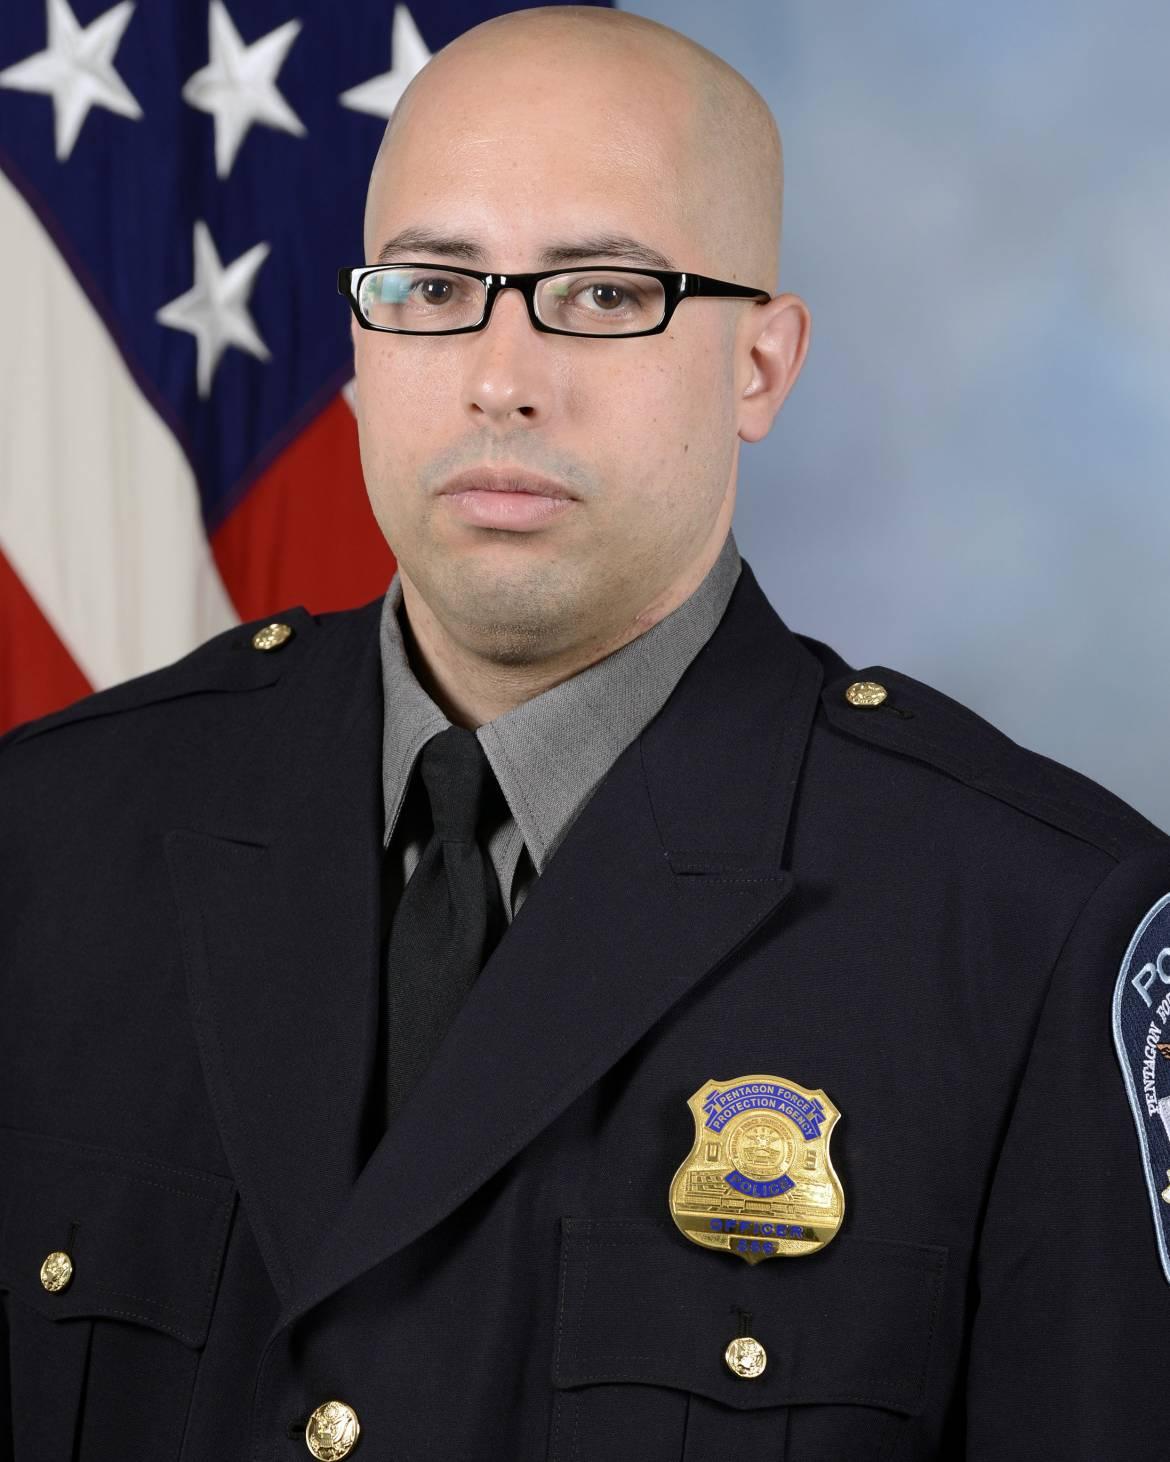 Police Officer George Gonzalez